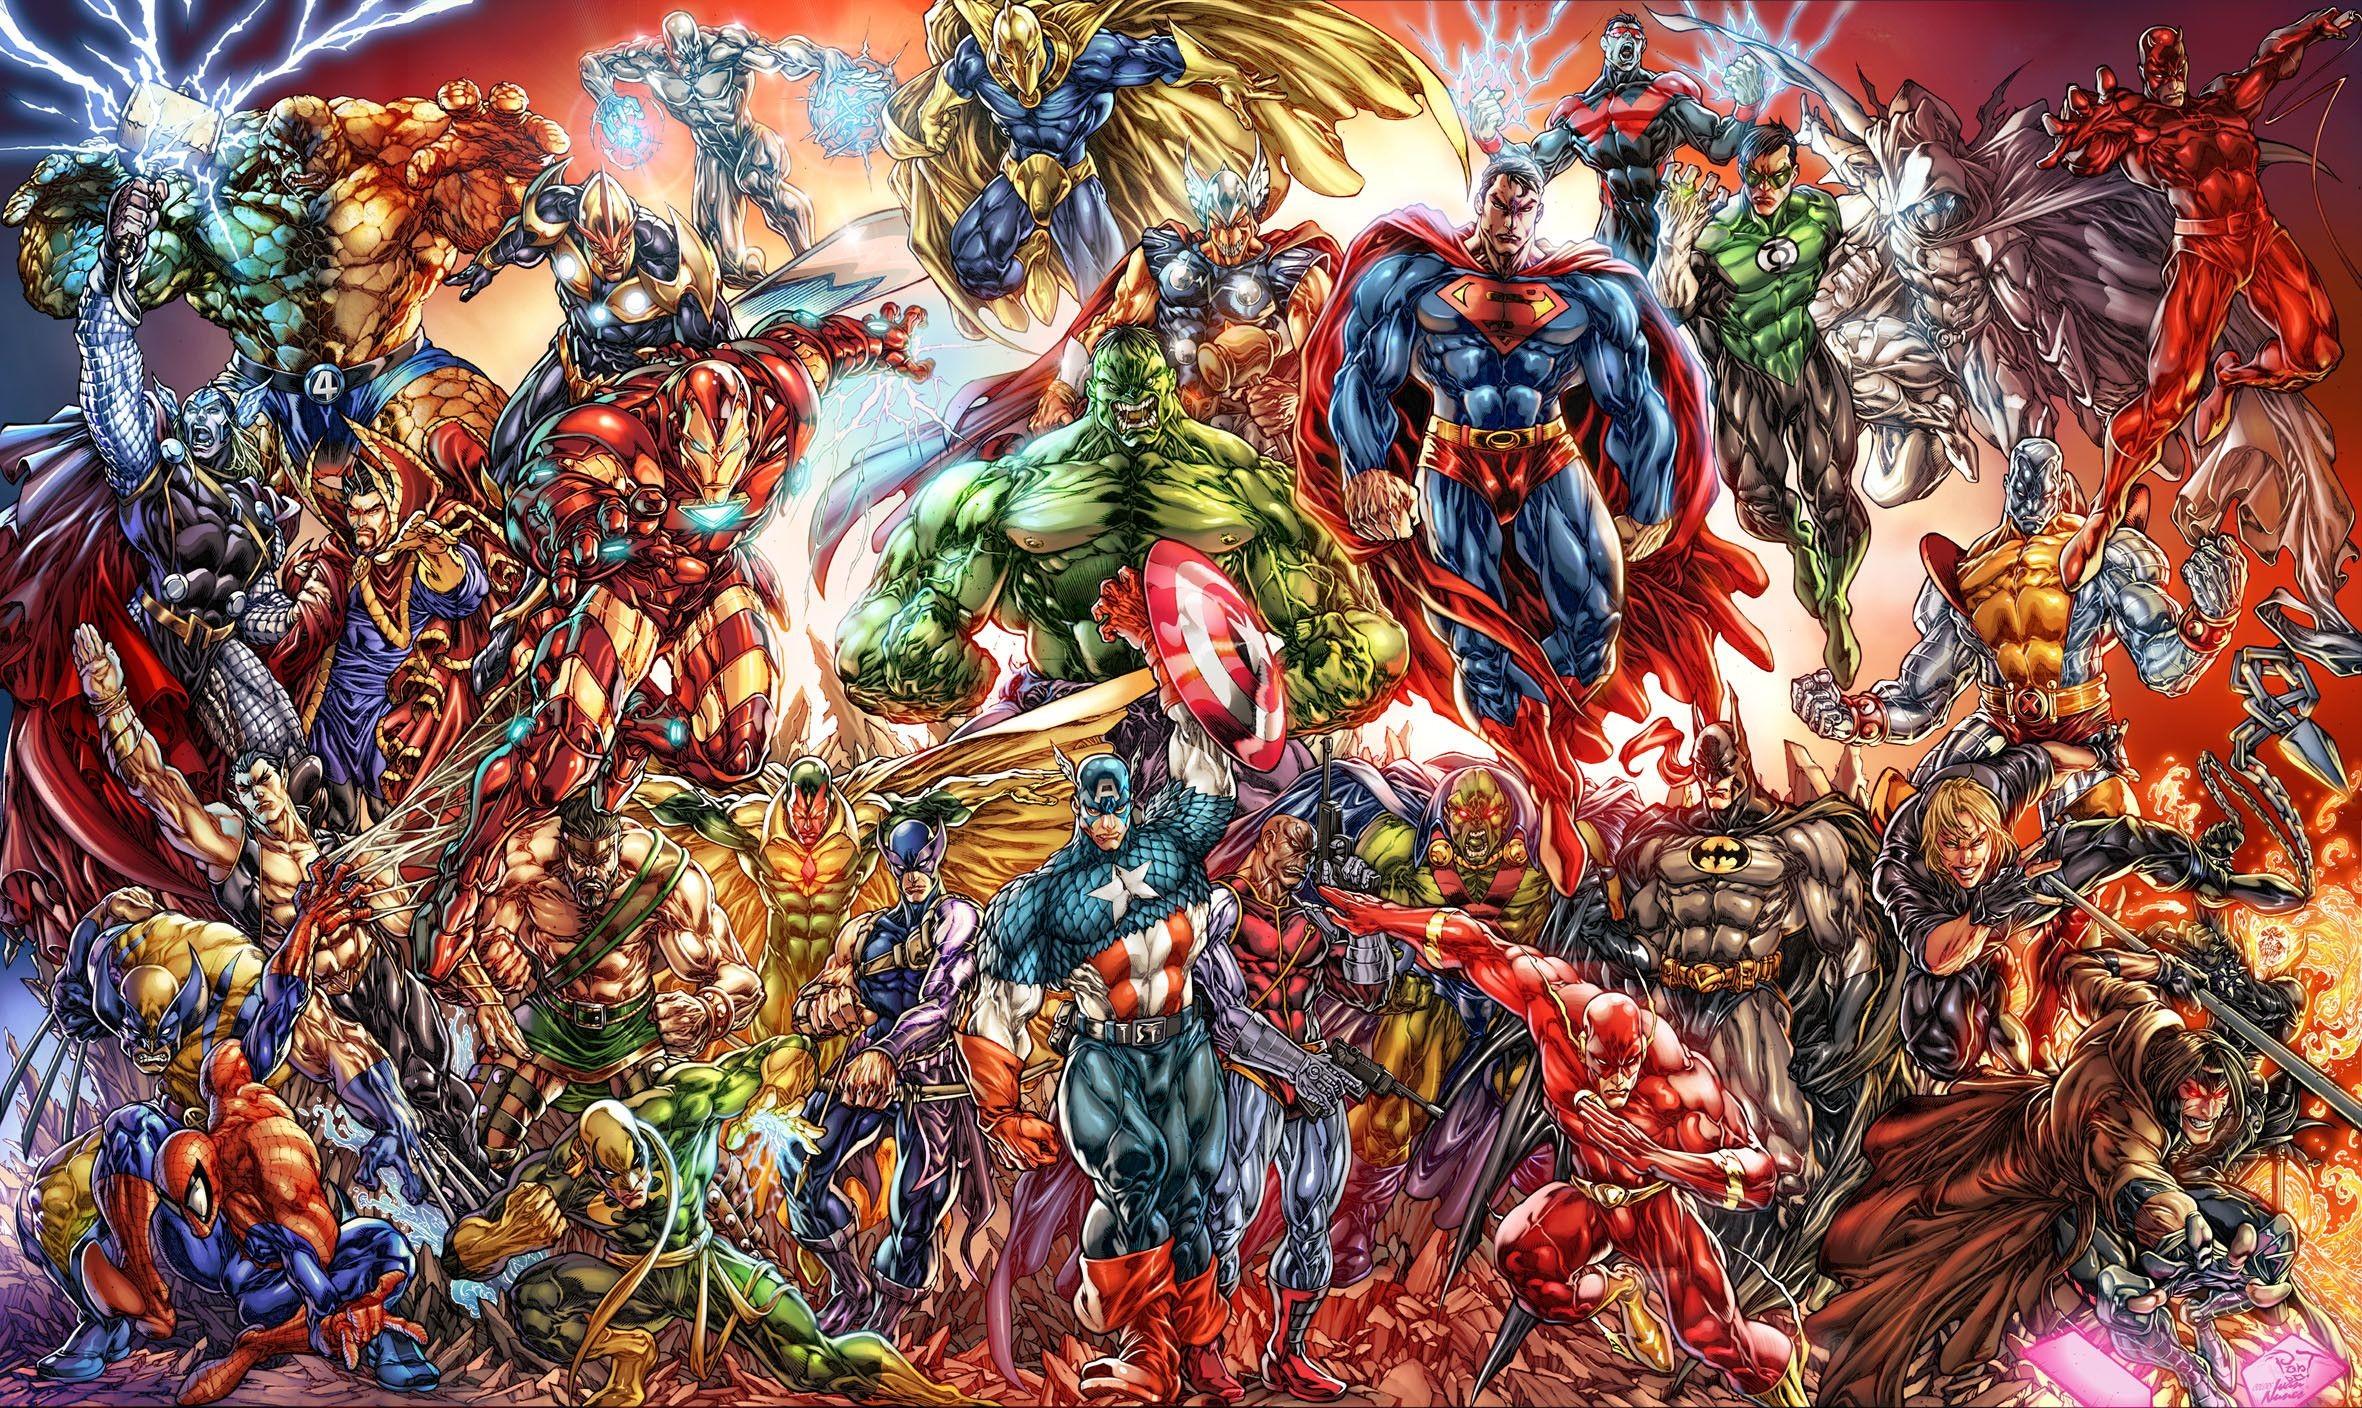 Comic Book Wallpapers for Desktop (77+ images)